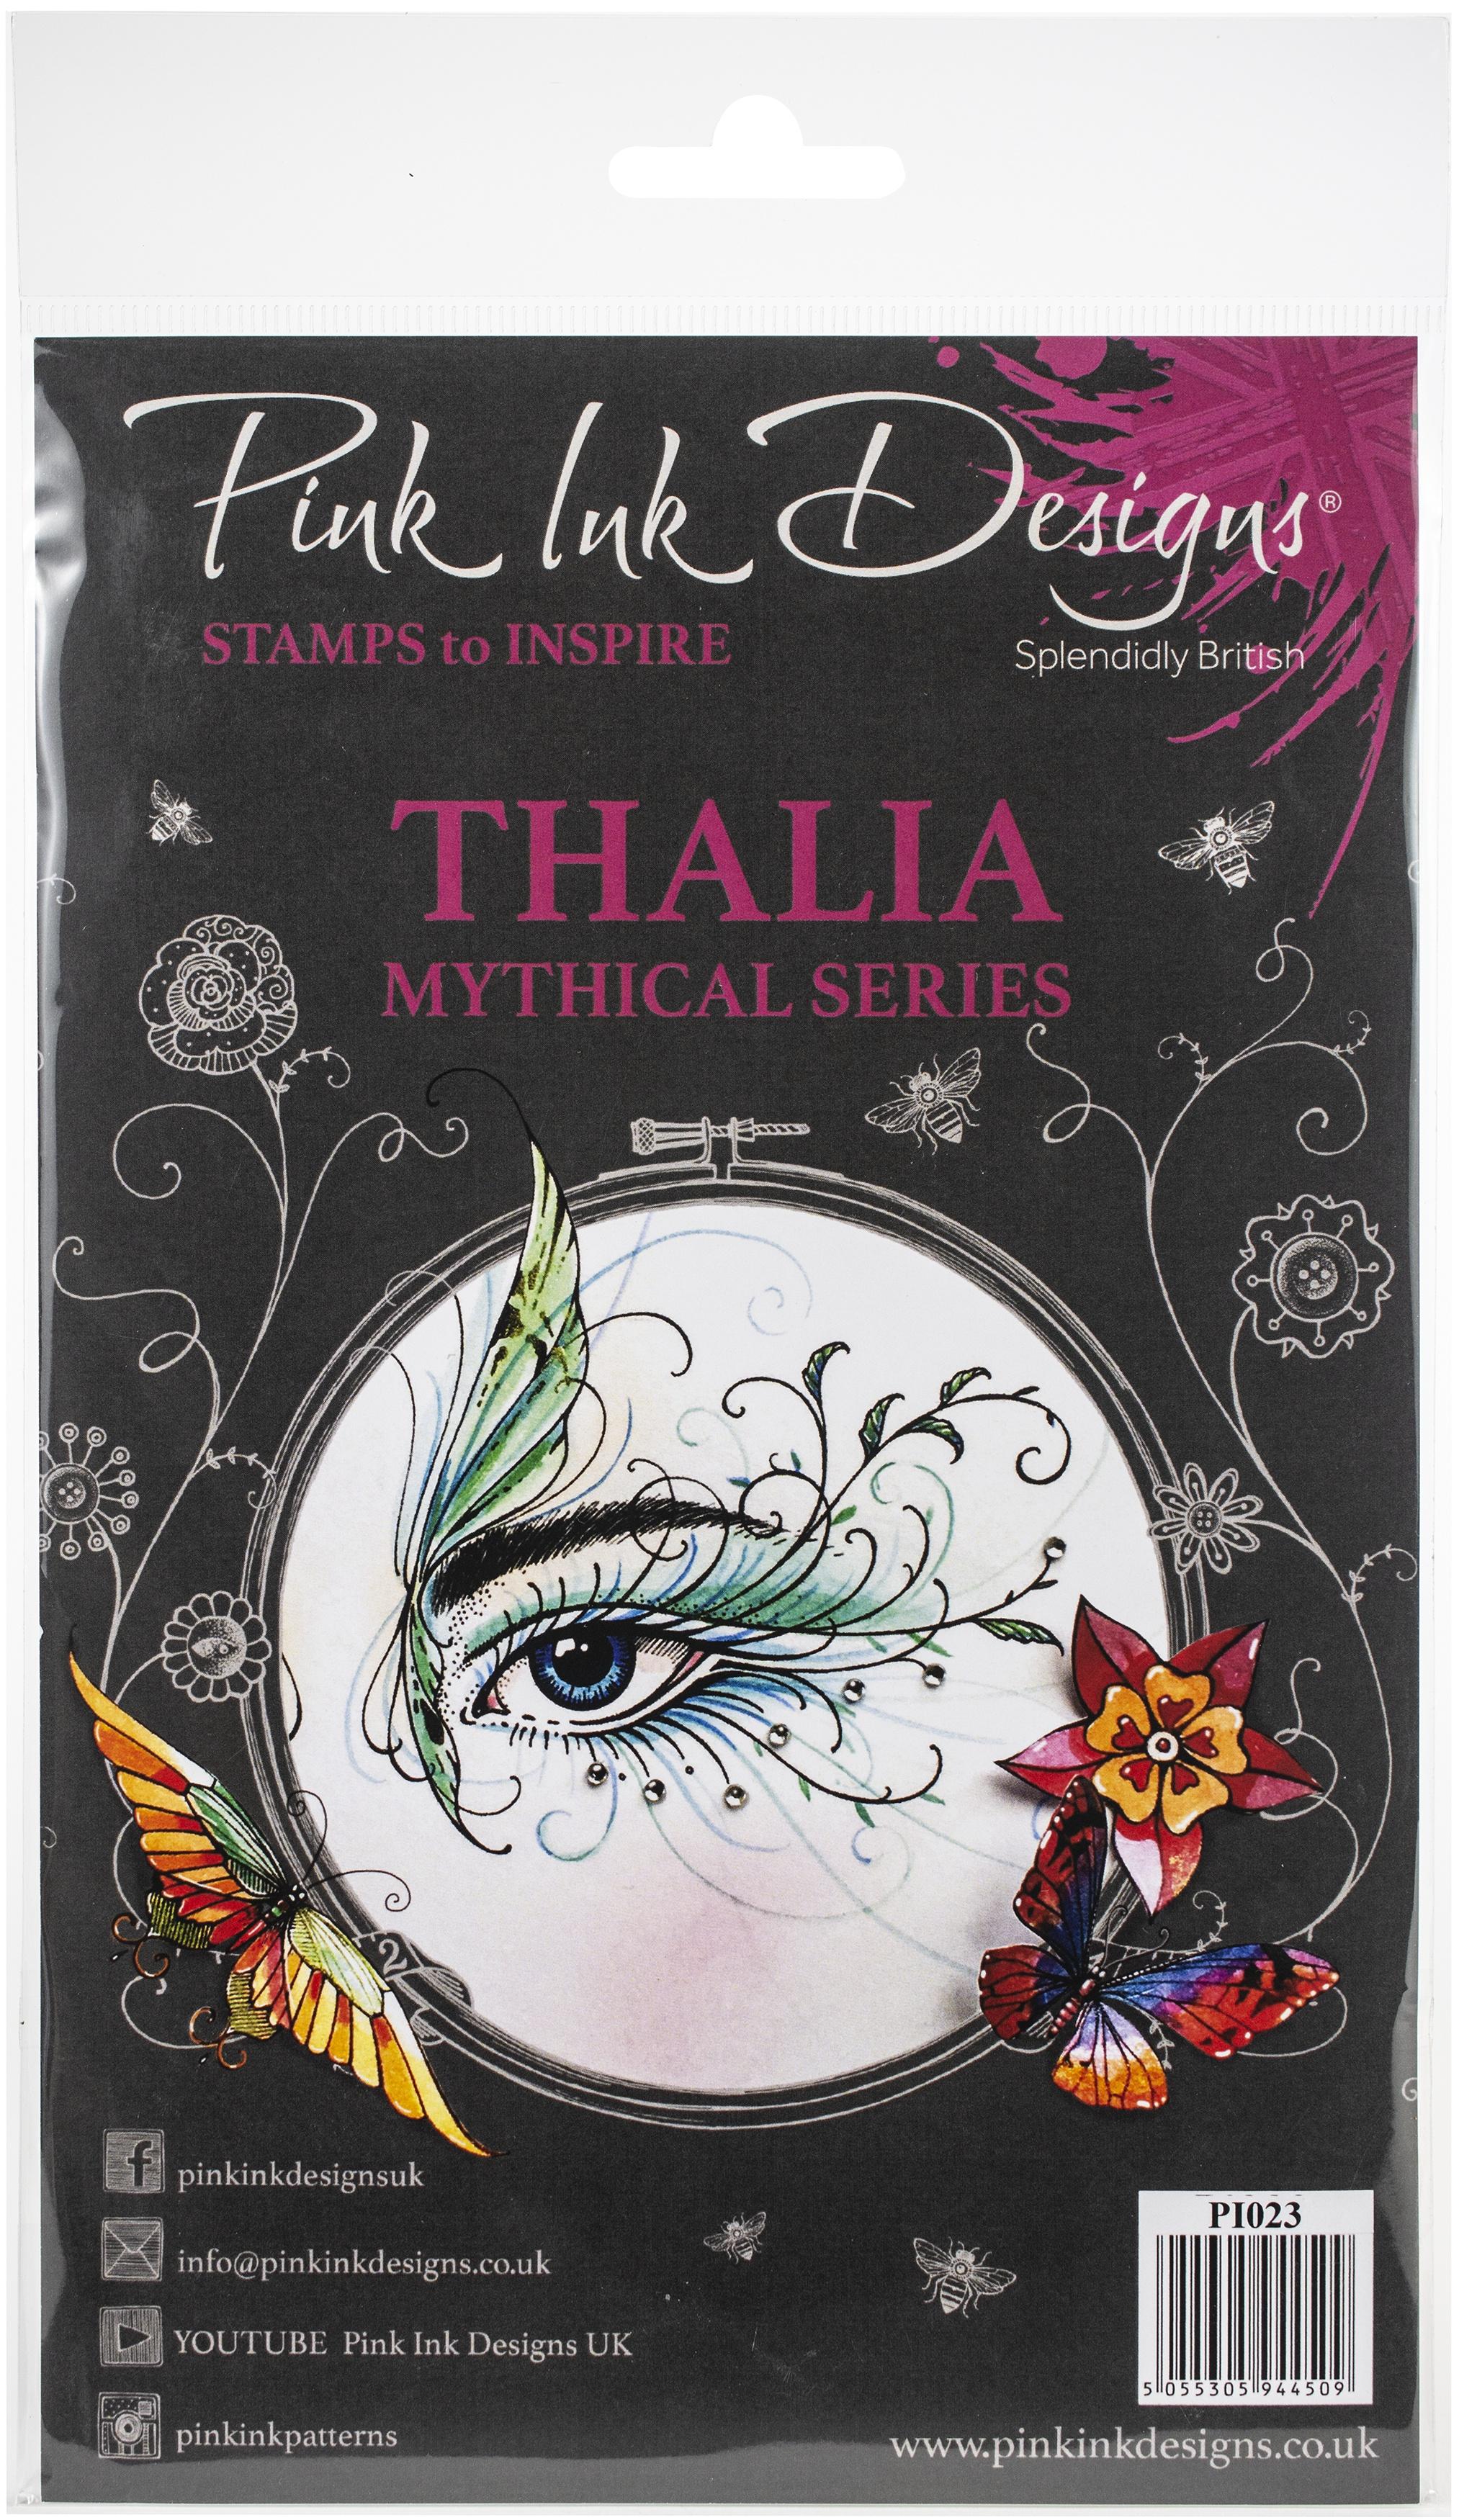 Pink Ink Designs A5 Clear Stamp Set-Thalia